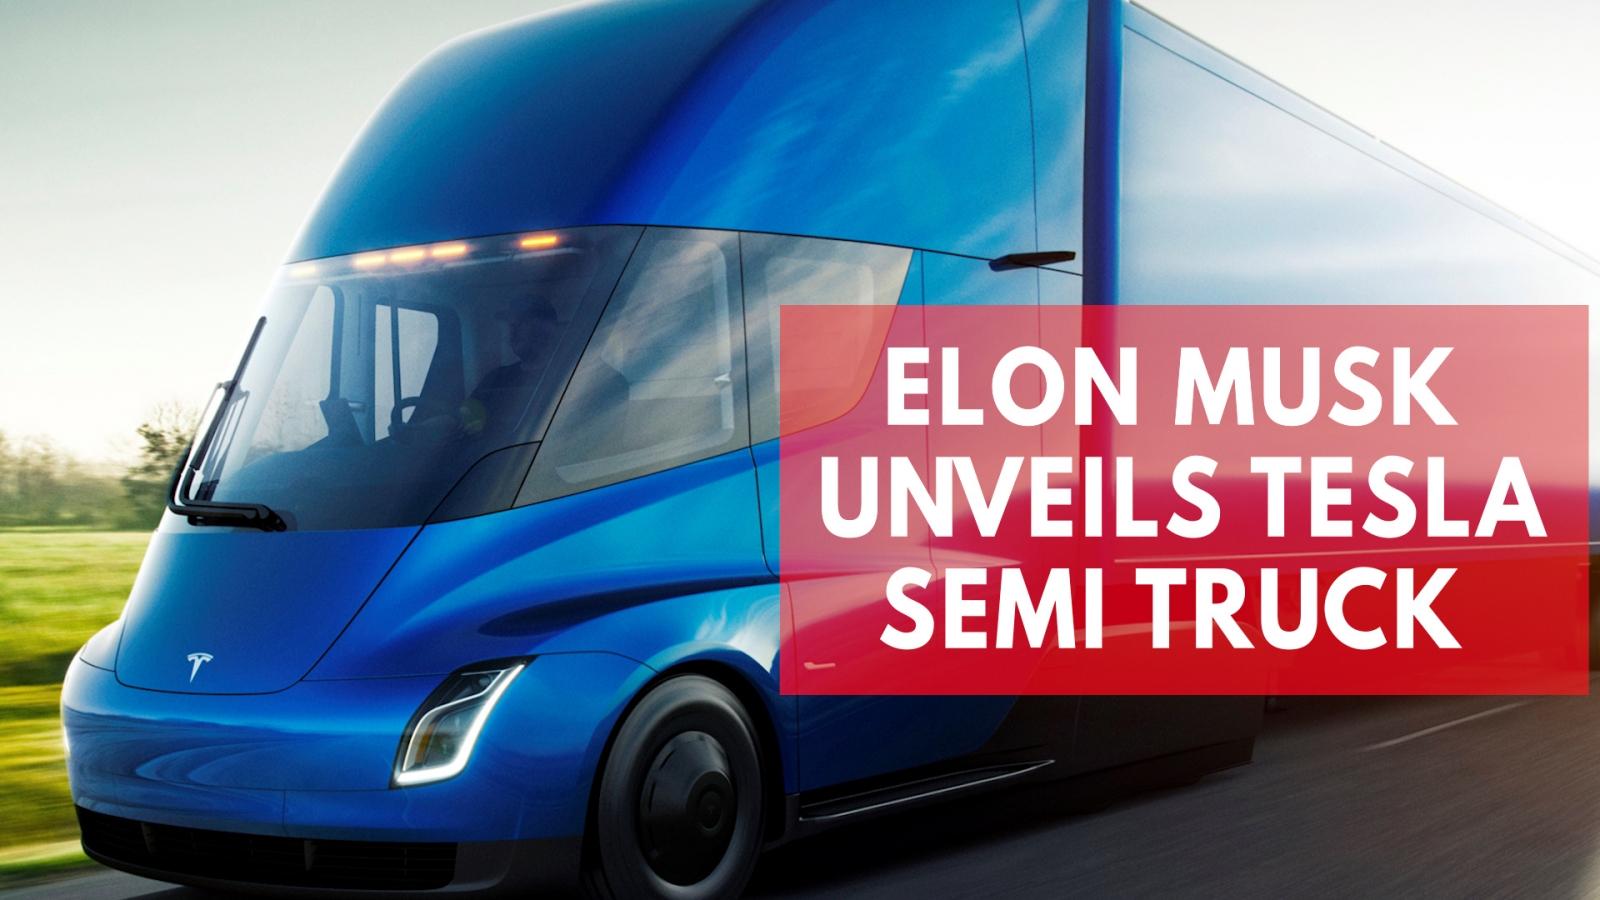 tesla-in-spotlight-as-elon-musk-unveils-electric-semi-truck-called-the-beast